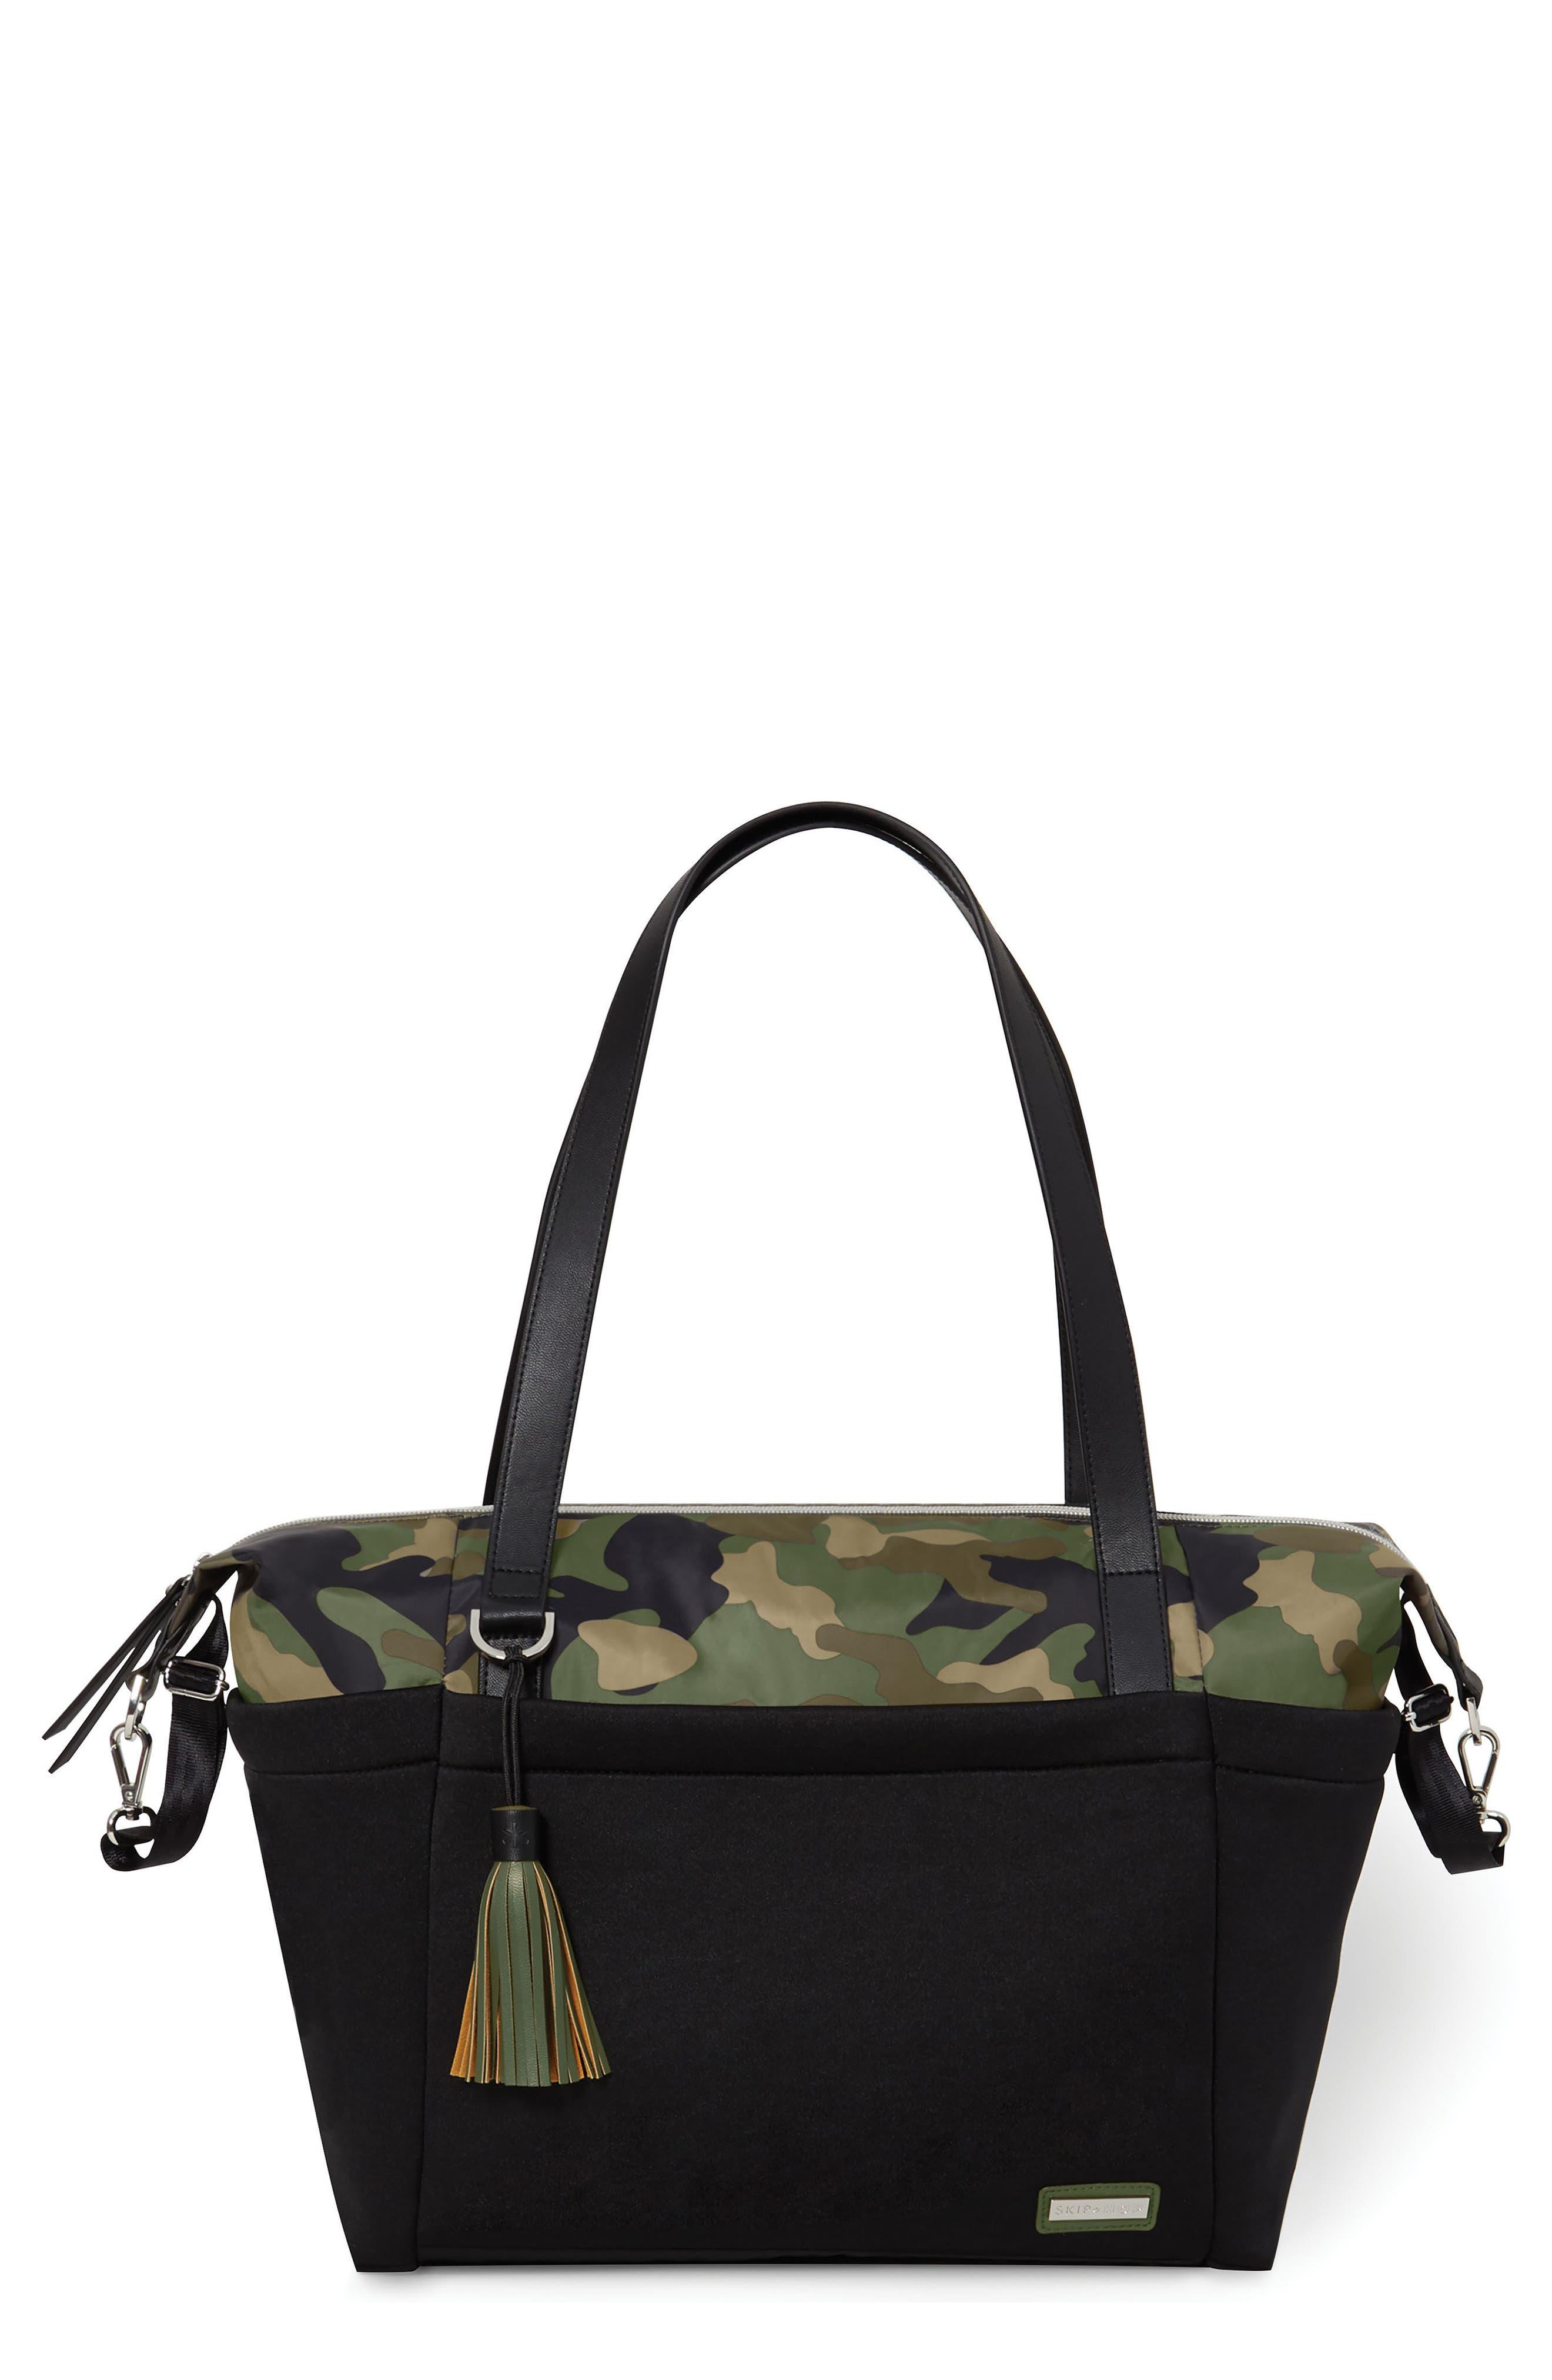 Main Image - Skip Hop Nolita Diaper Bag